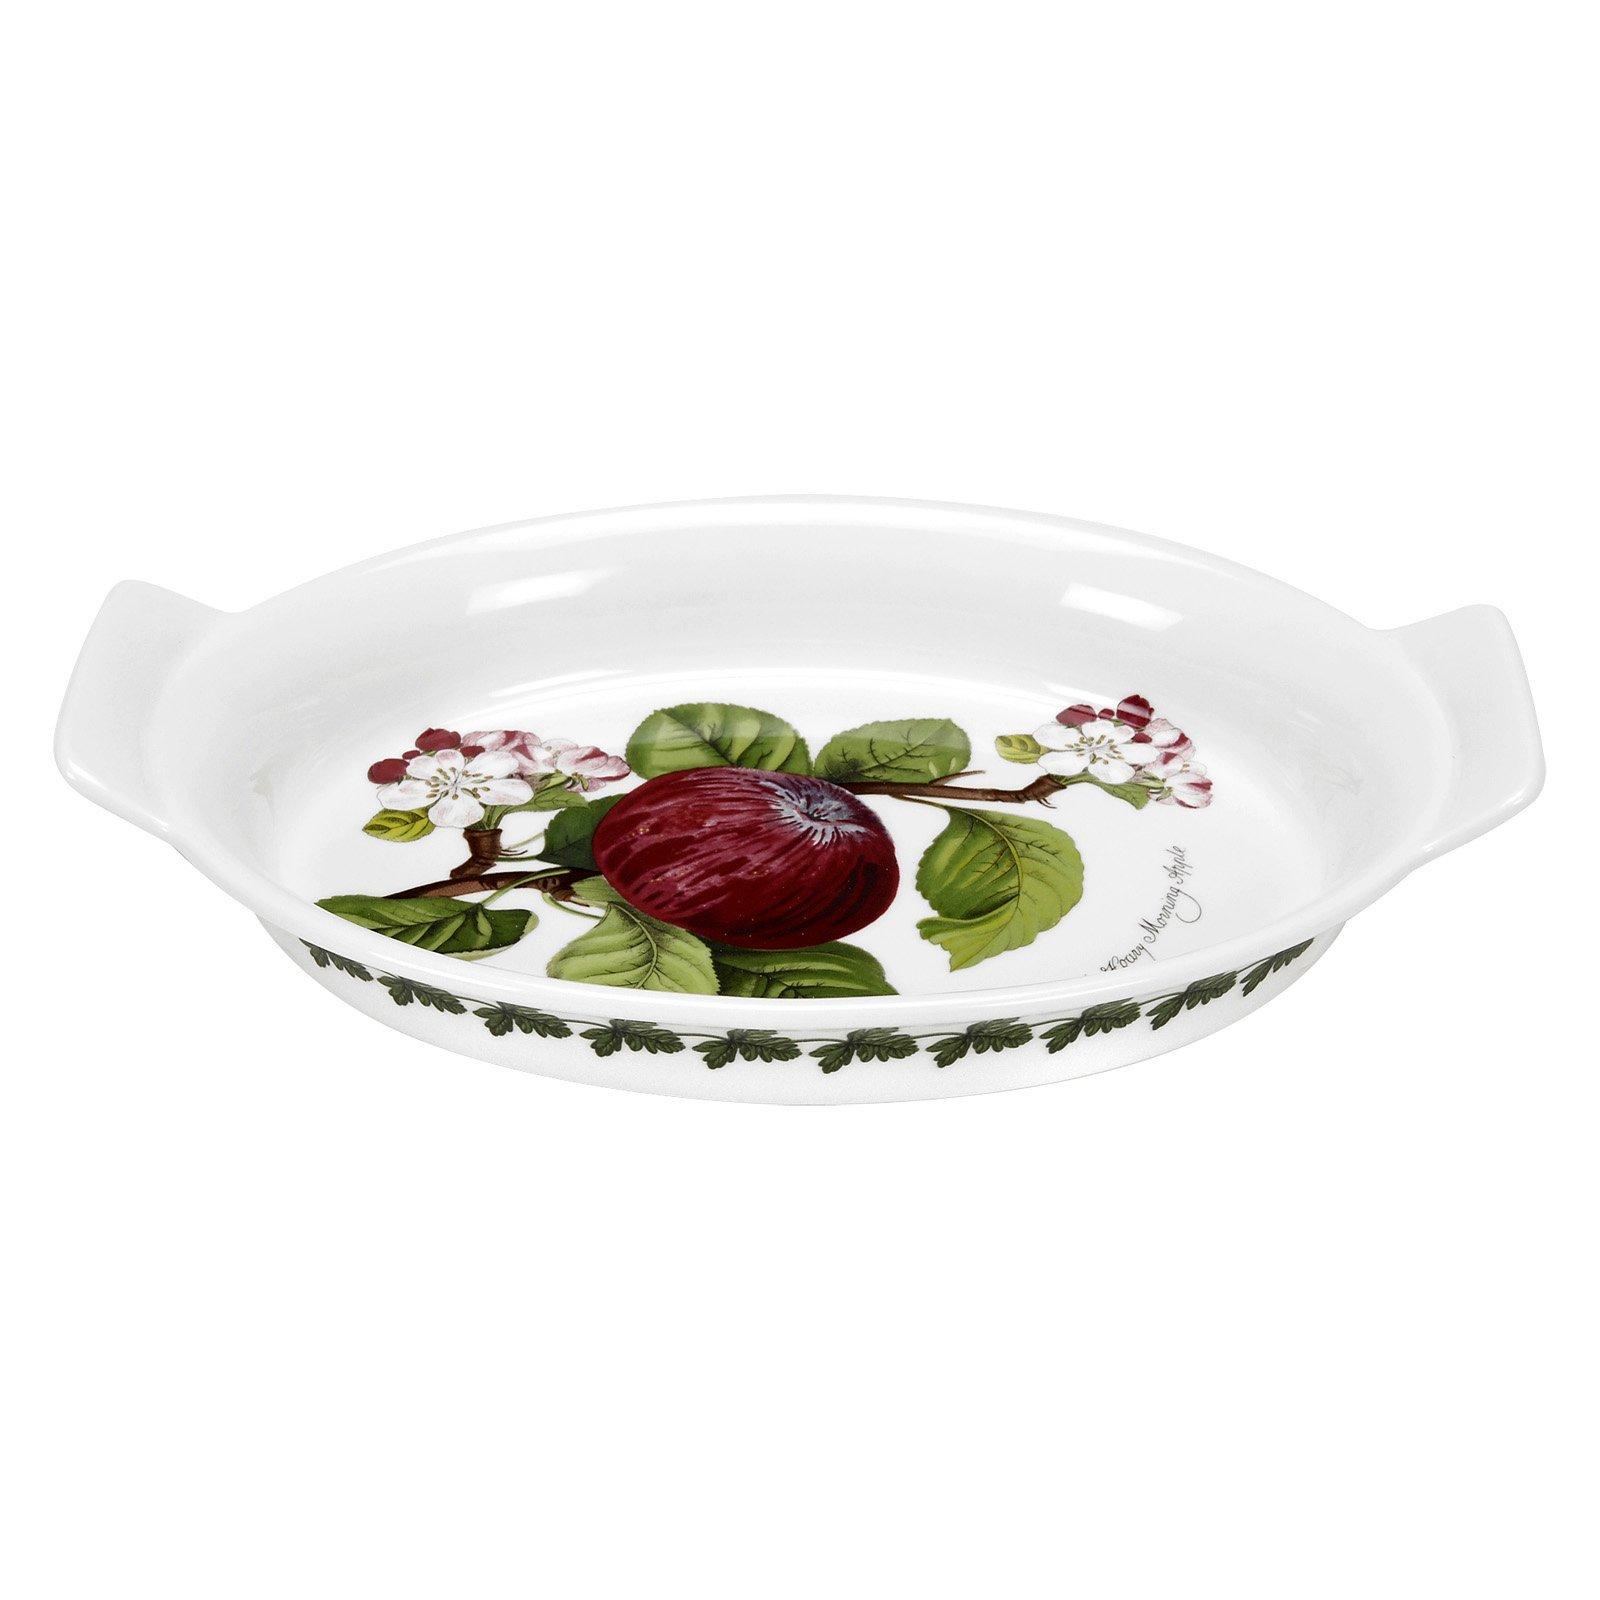 Portmeirion Pomona Earthenware 9-Inch Gratin Dish by Portmeirion (Image #1)